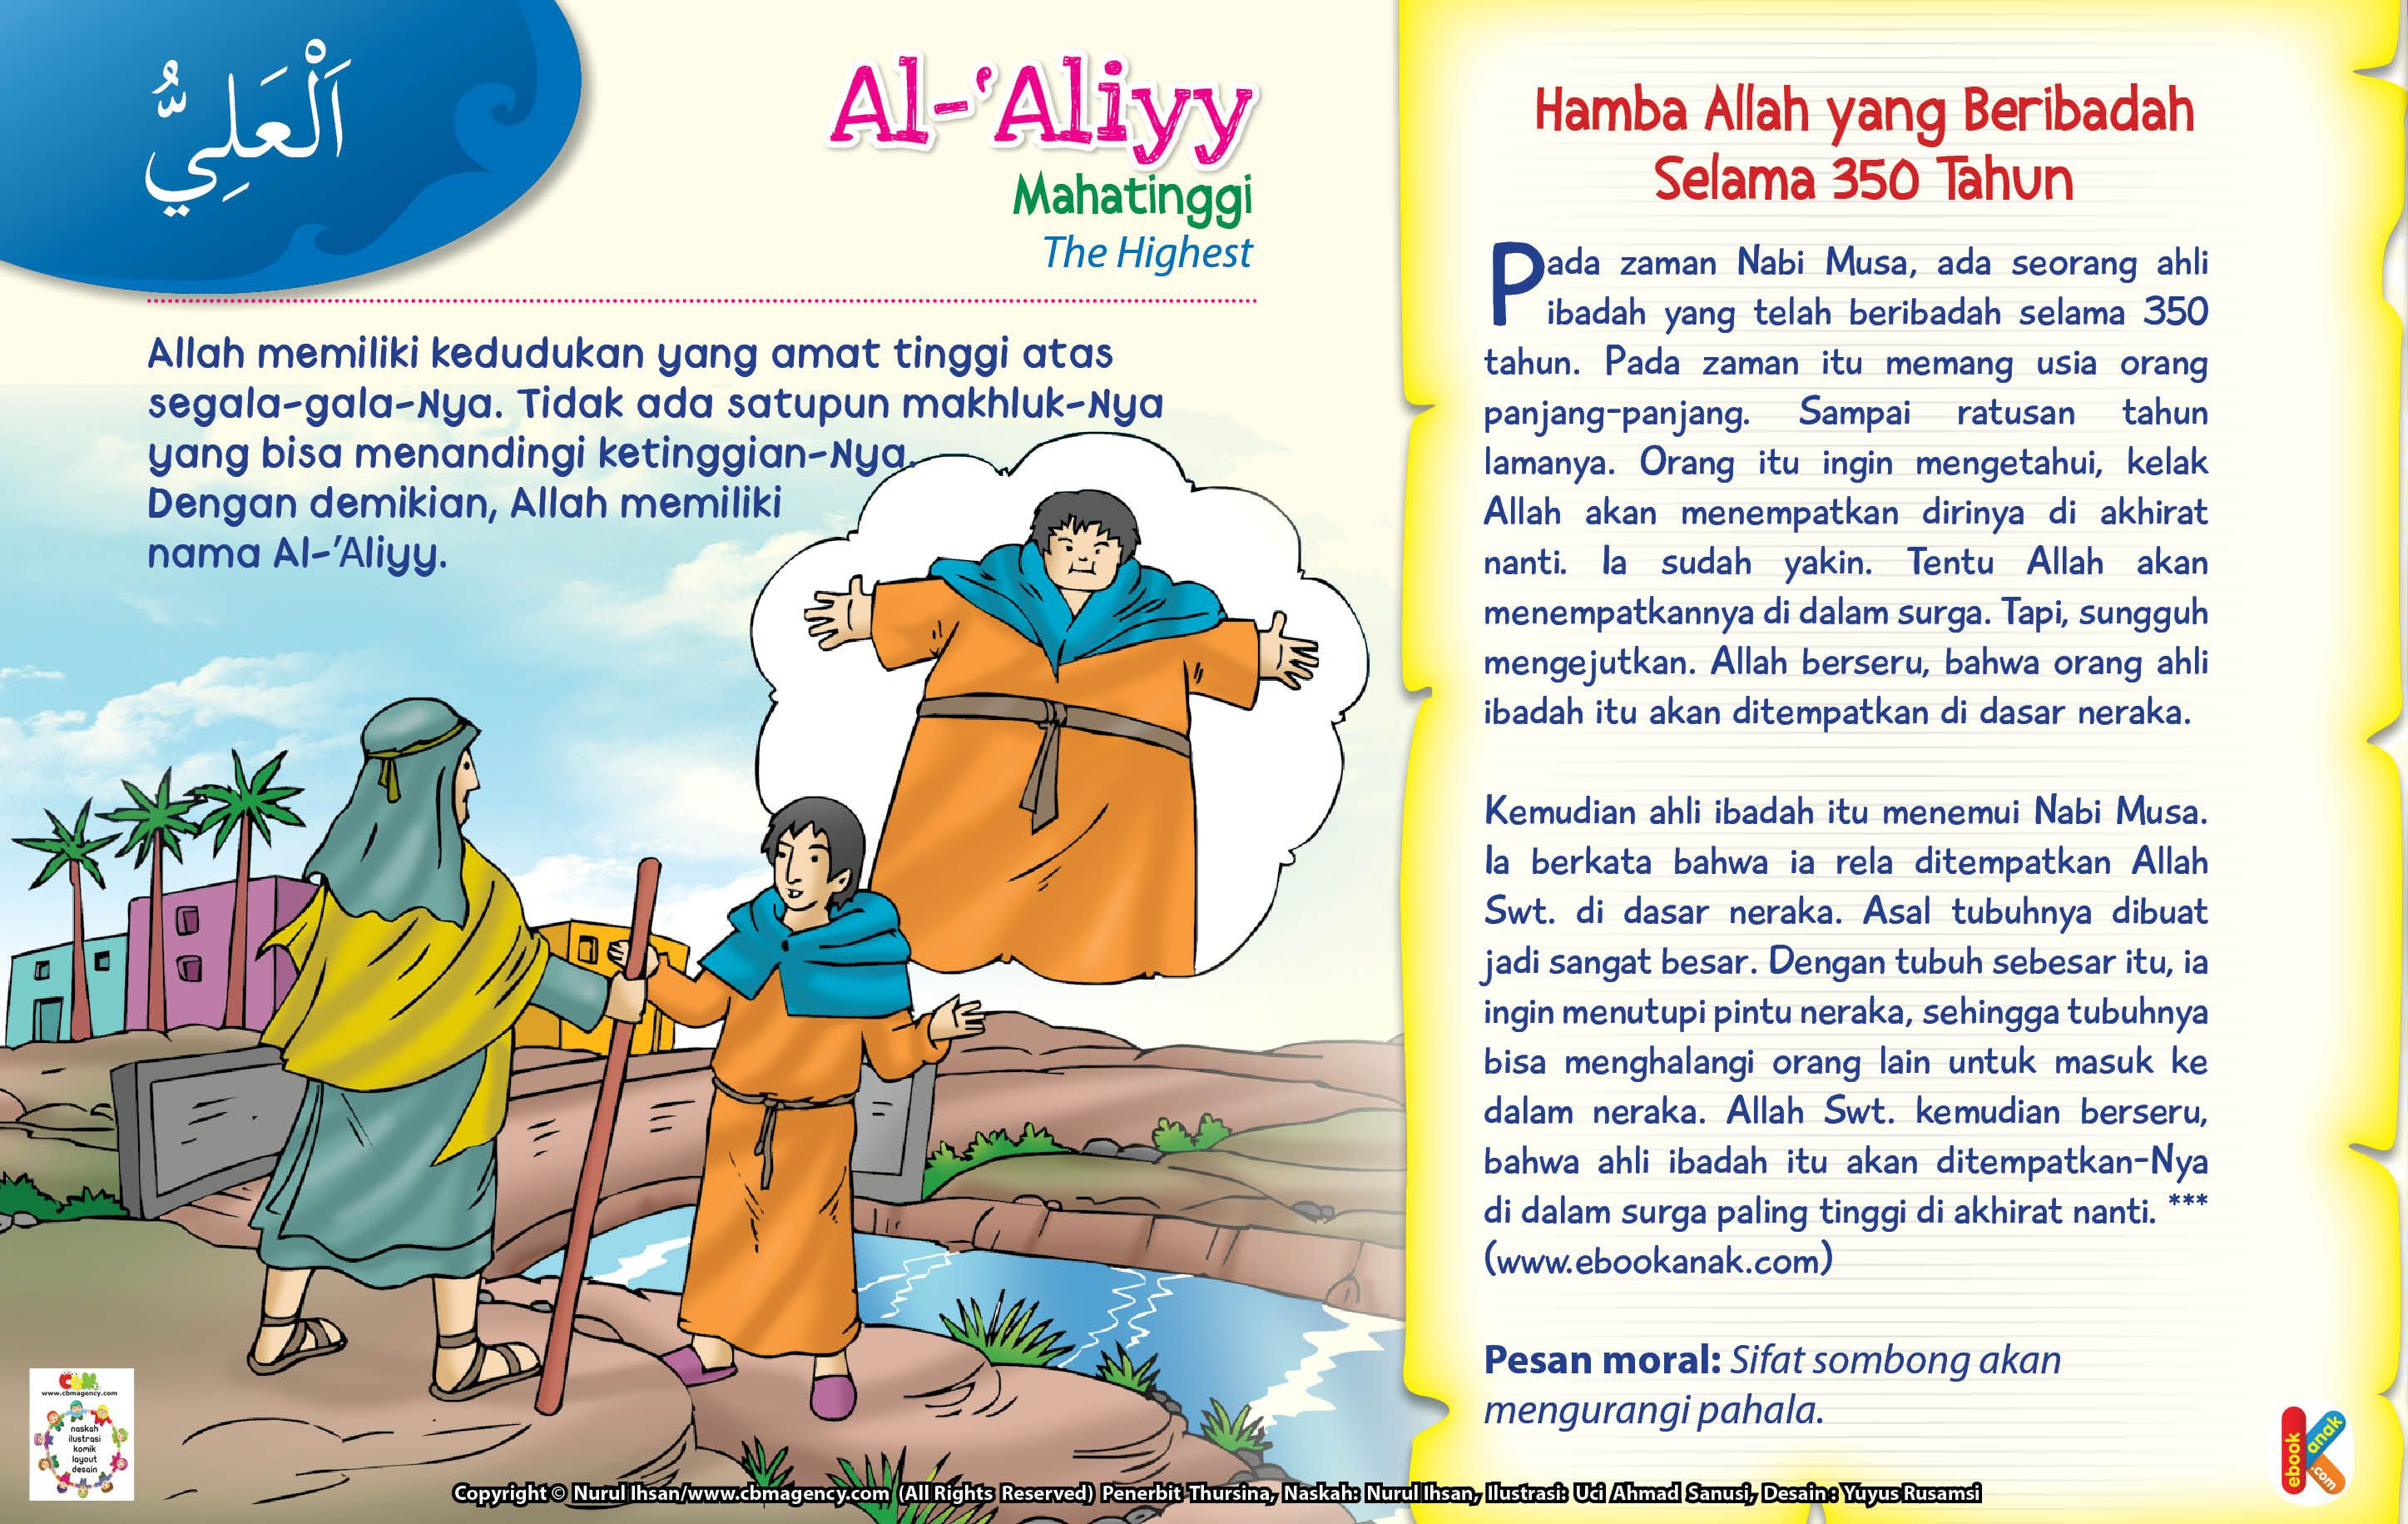 Kisah Asma'ul Husna Al'Aliiy Anak, Kutipan terbaik, Belajar